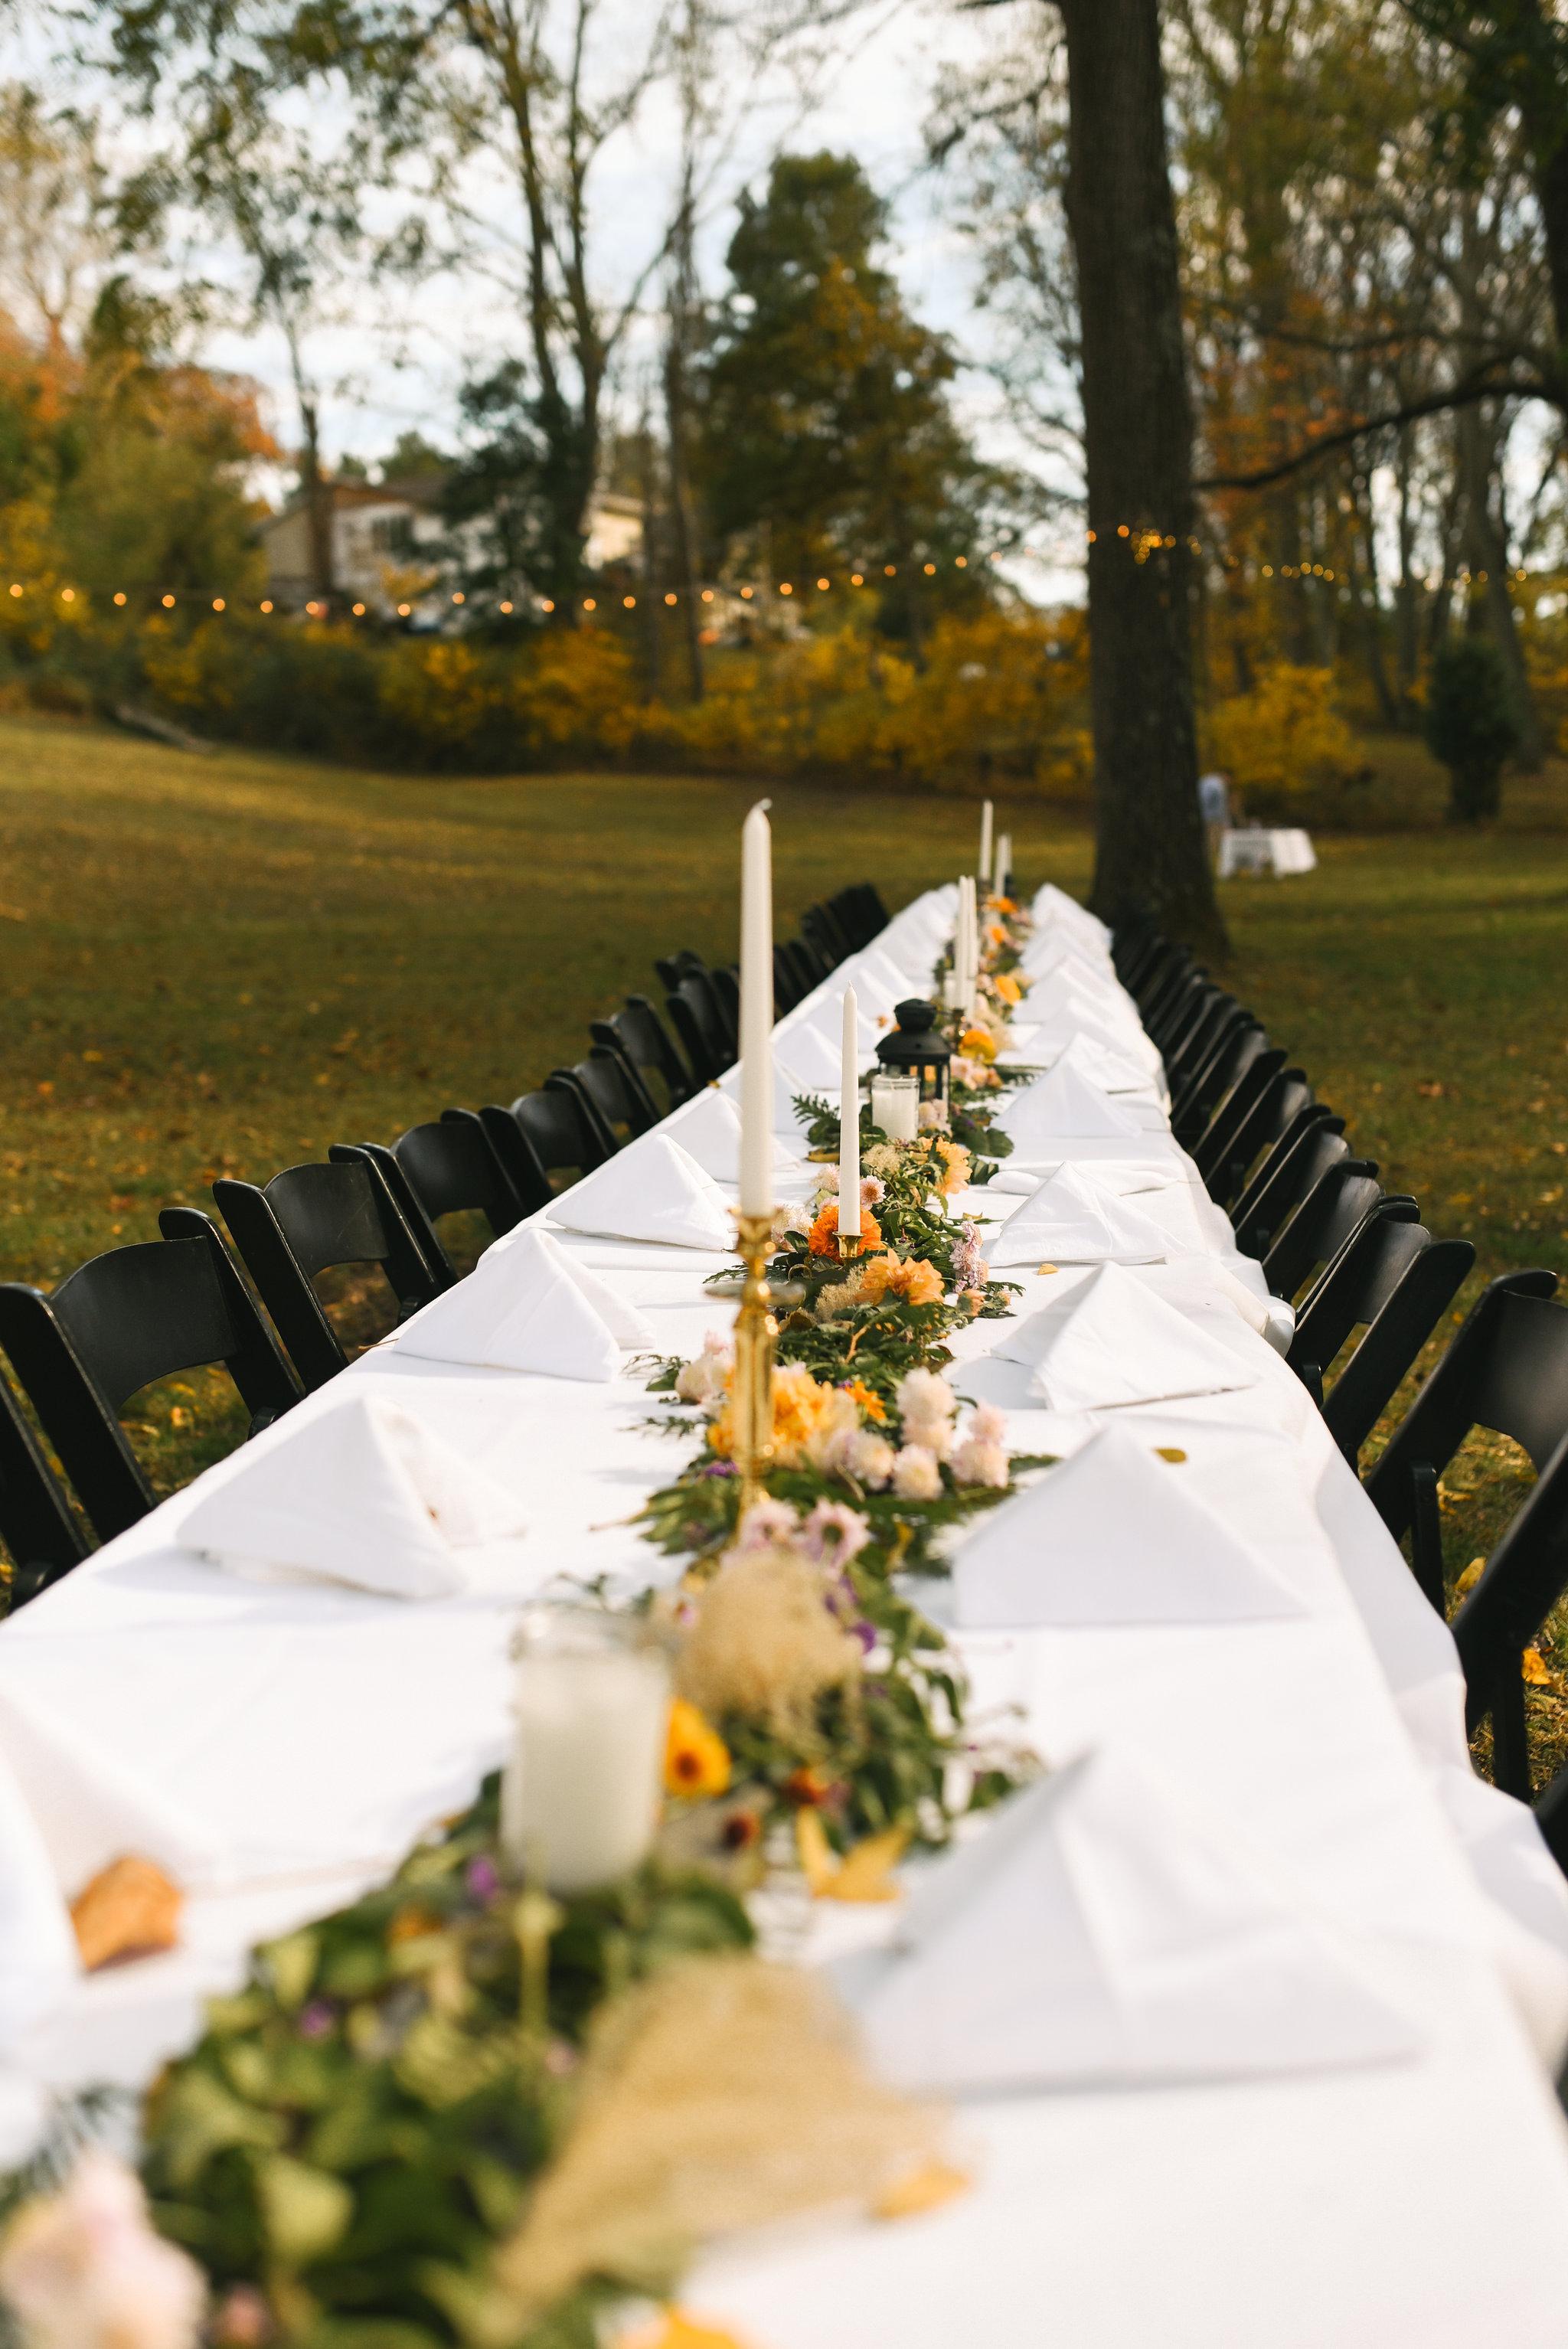 Baltimore, Maryland Wedding Photographer, Backyard Wedding, DIY, Rustic, Casual, Fall Wedding, Woodland, Banquet Table at Reception, Butterbee Farm Floral Centerpieces